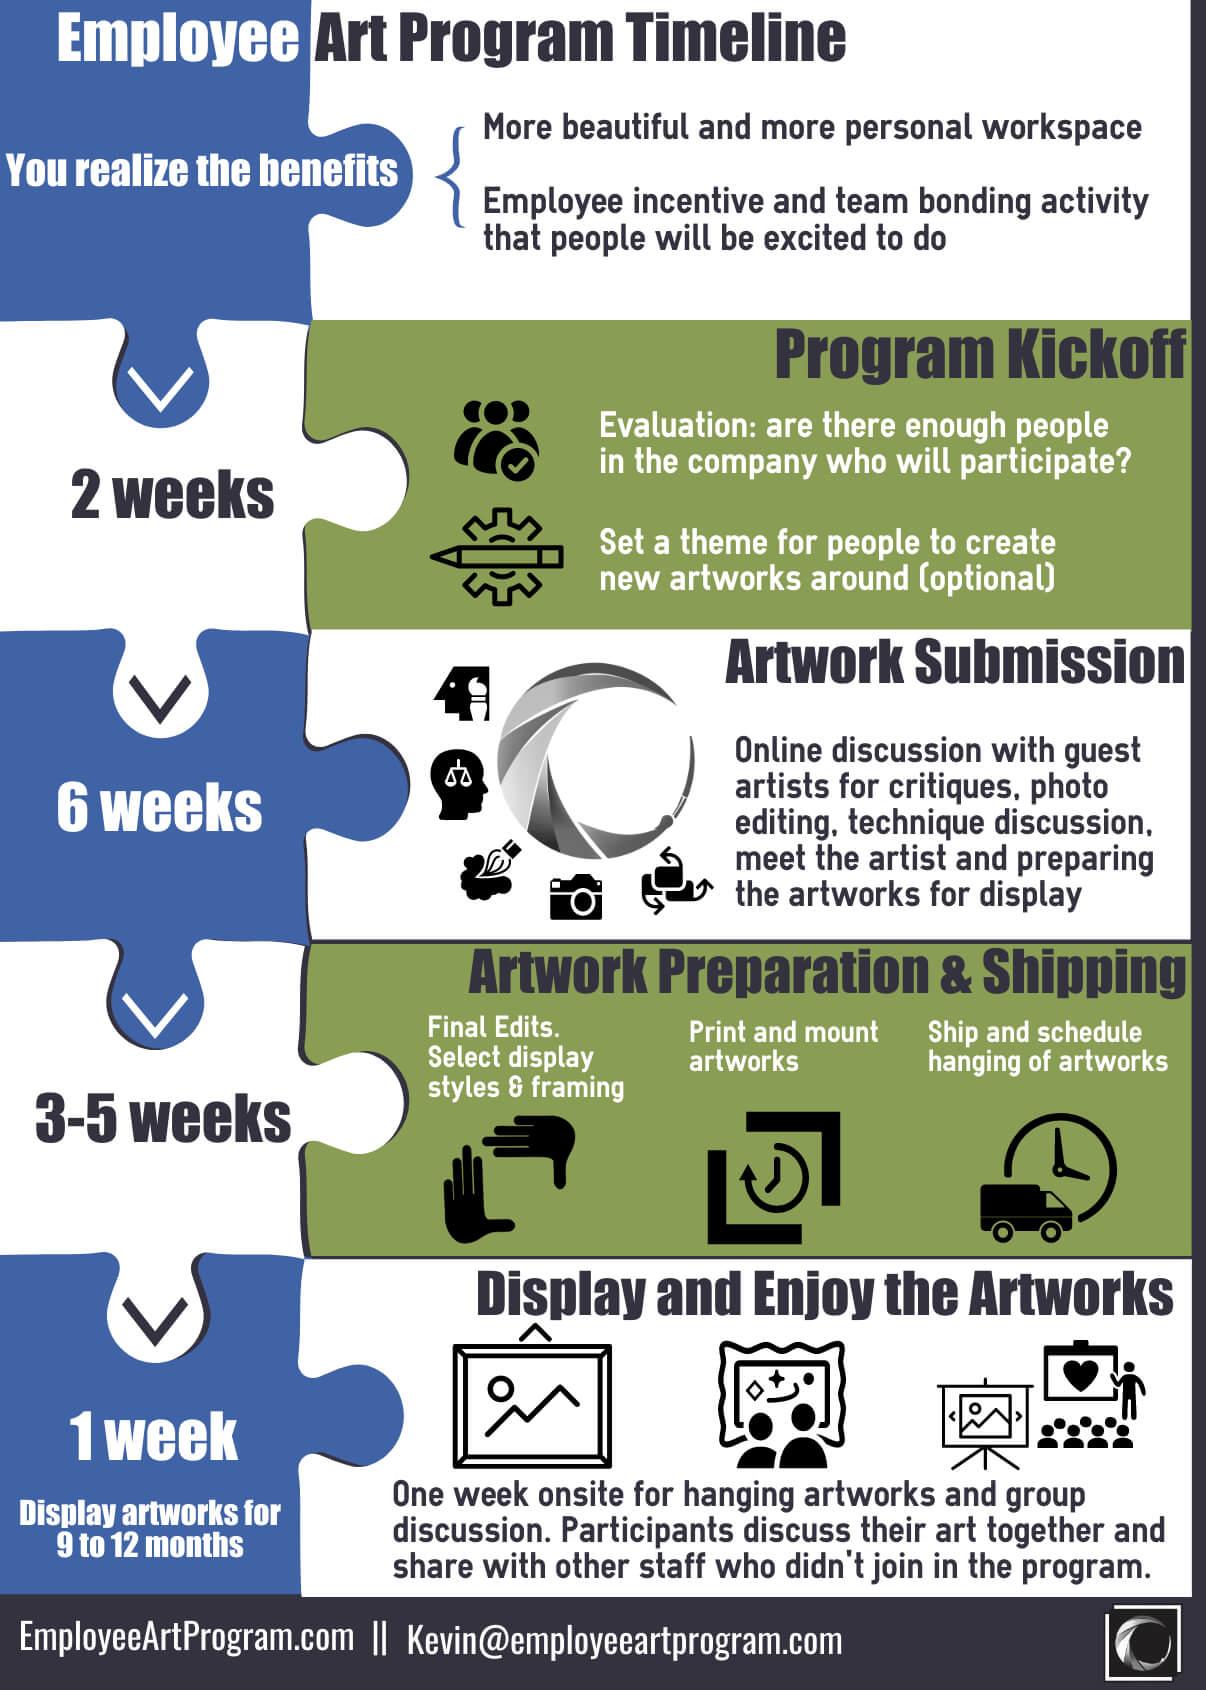 Employee Art Program Timeline